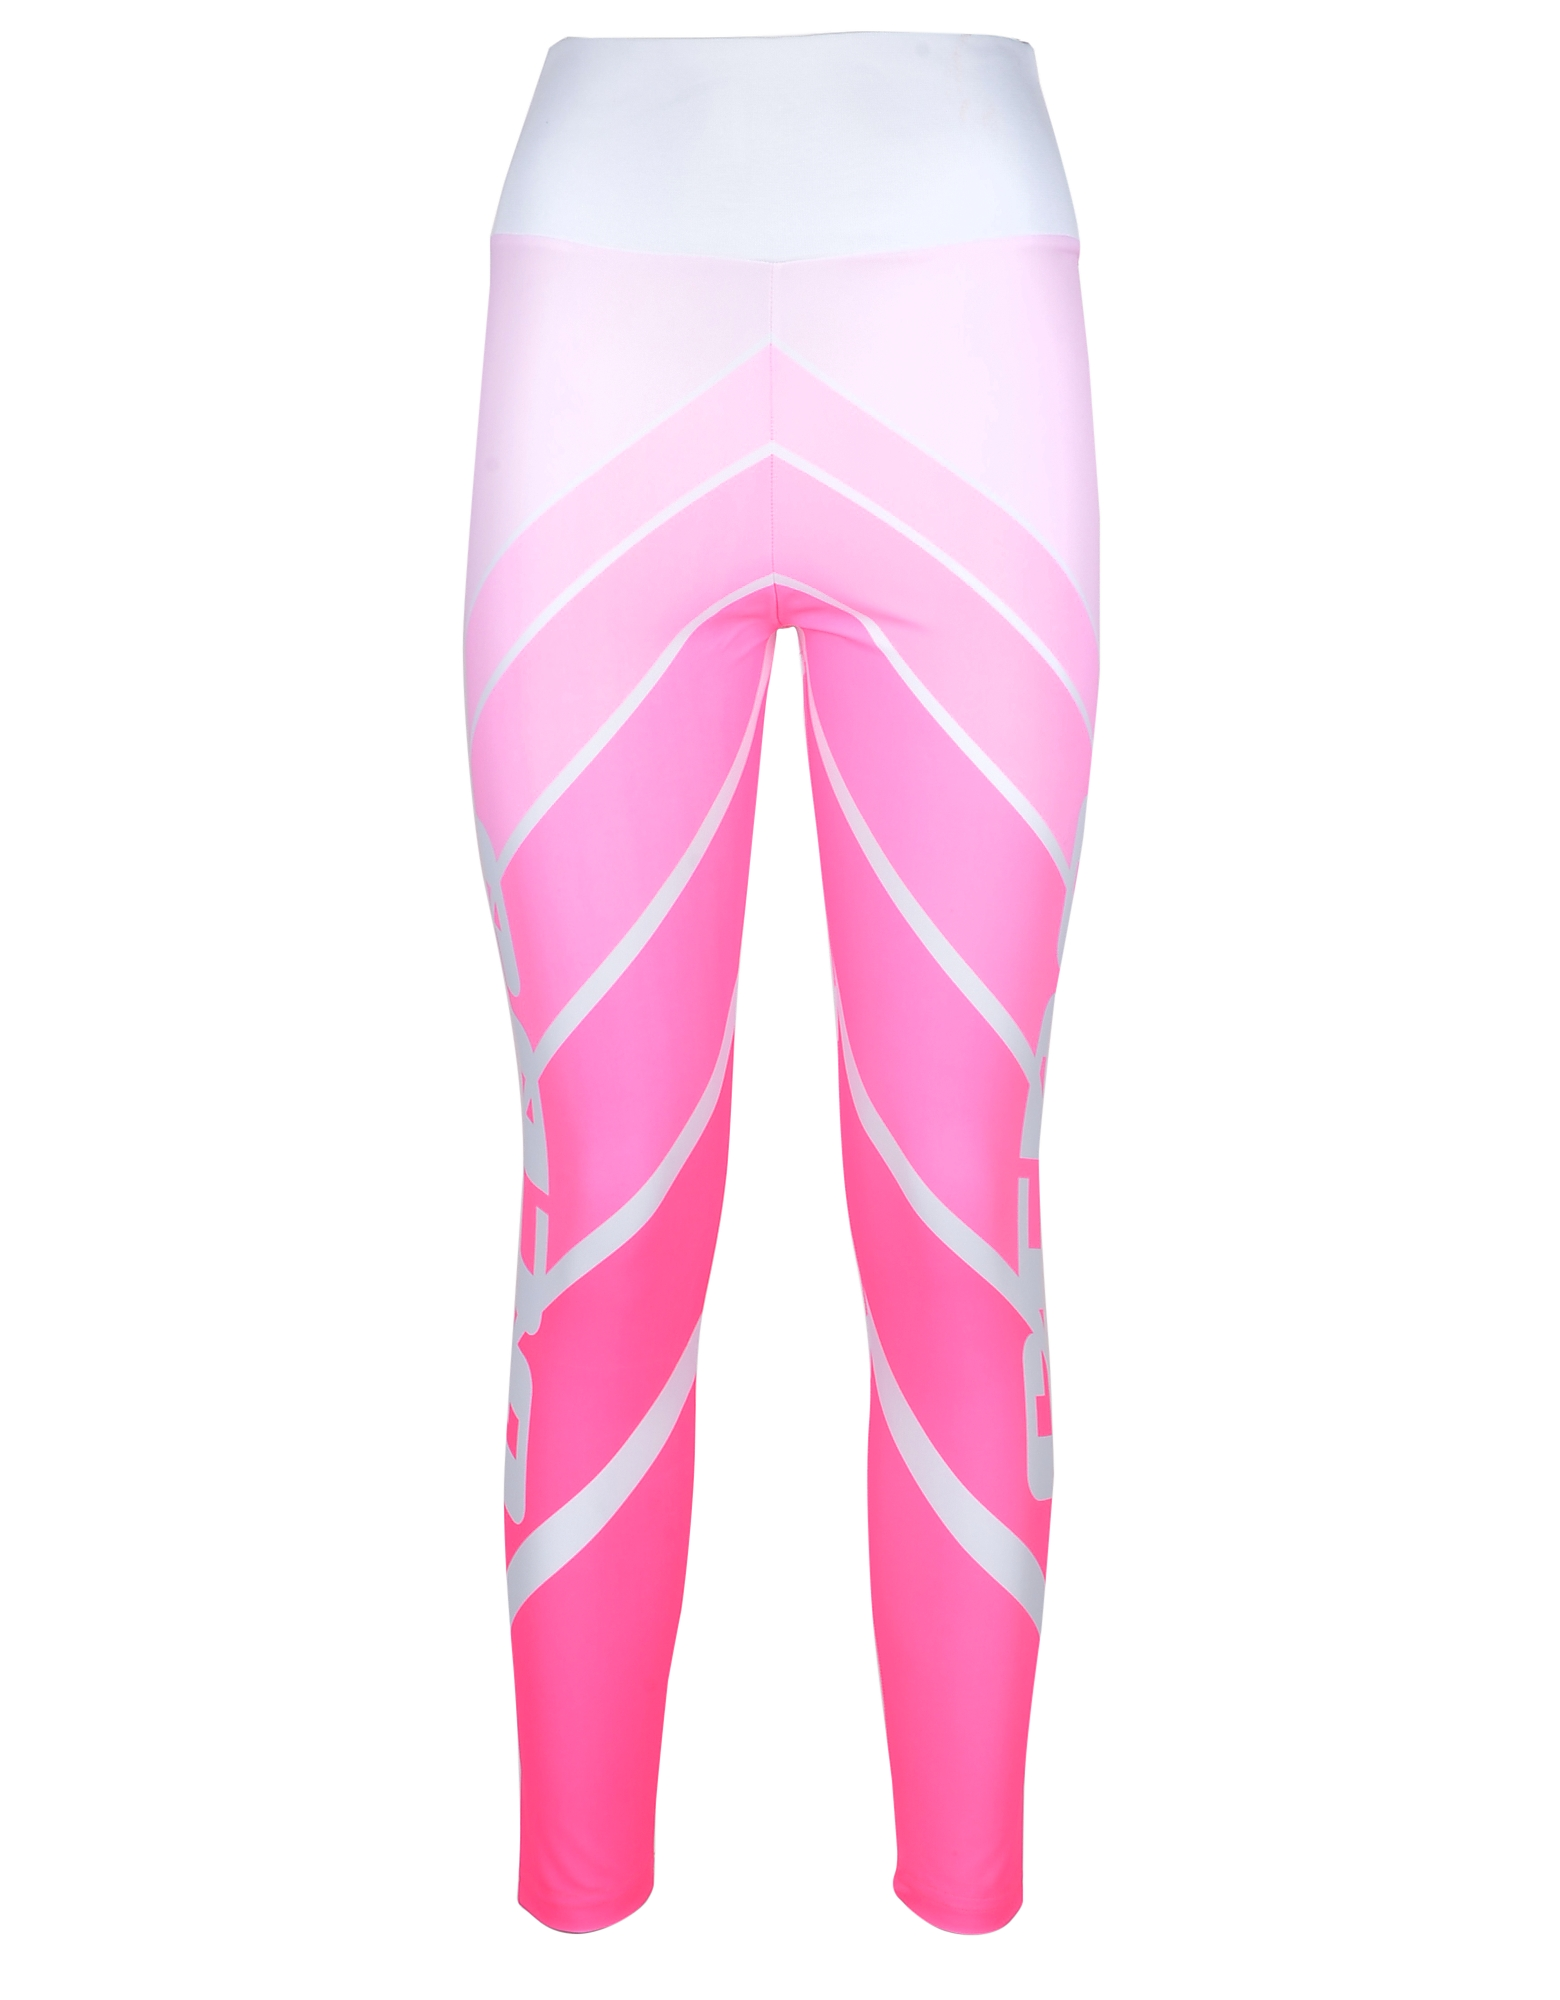 GCDS Designer Pants, Women's Pink Leggings